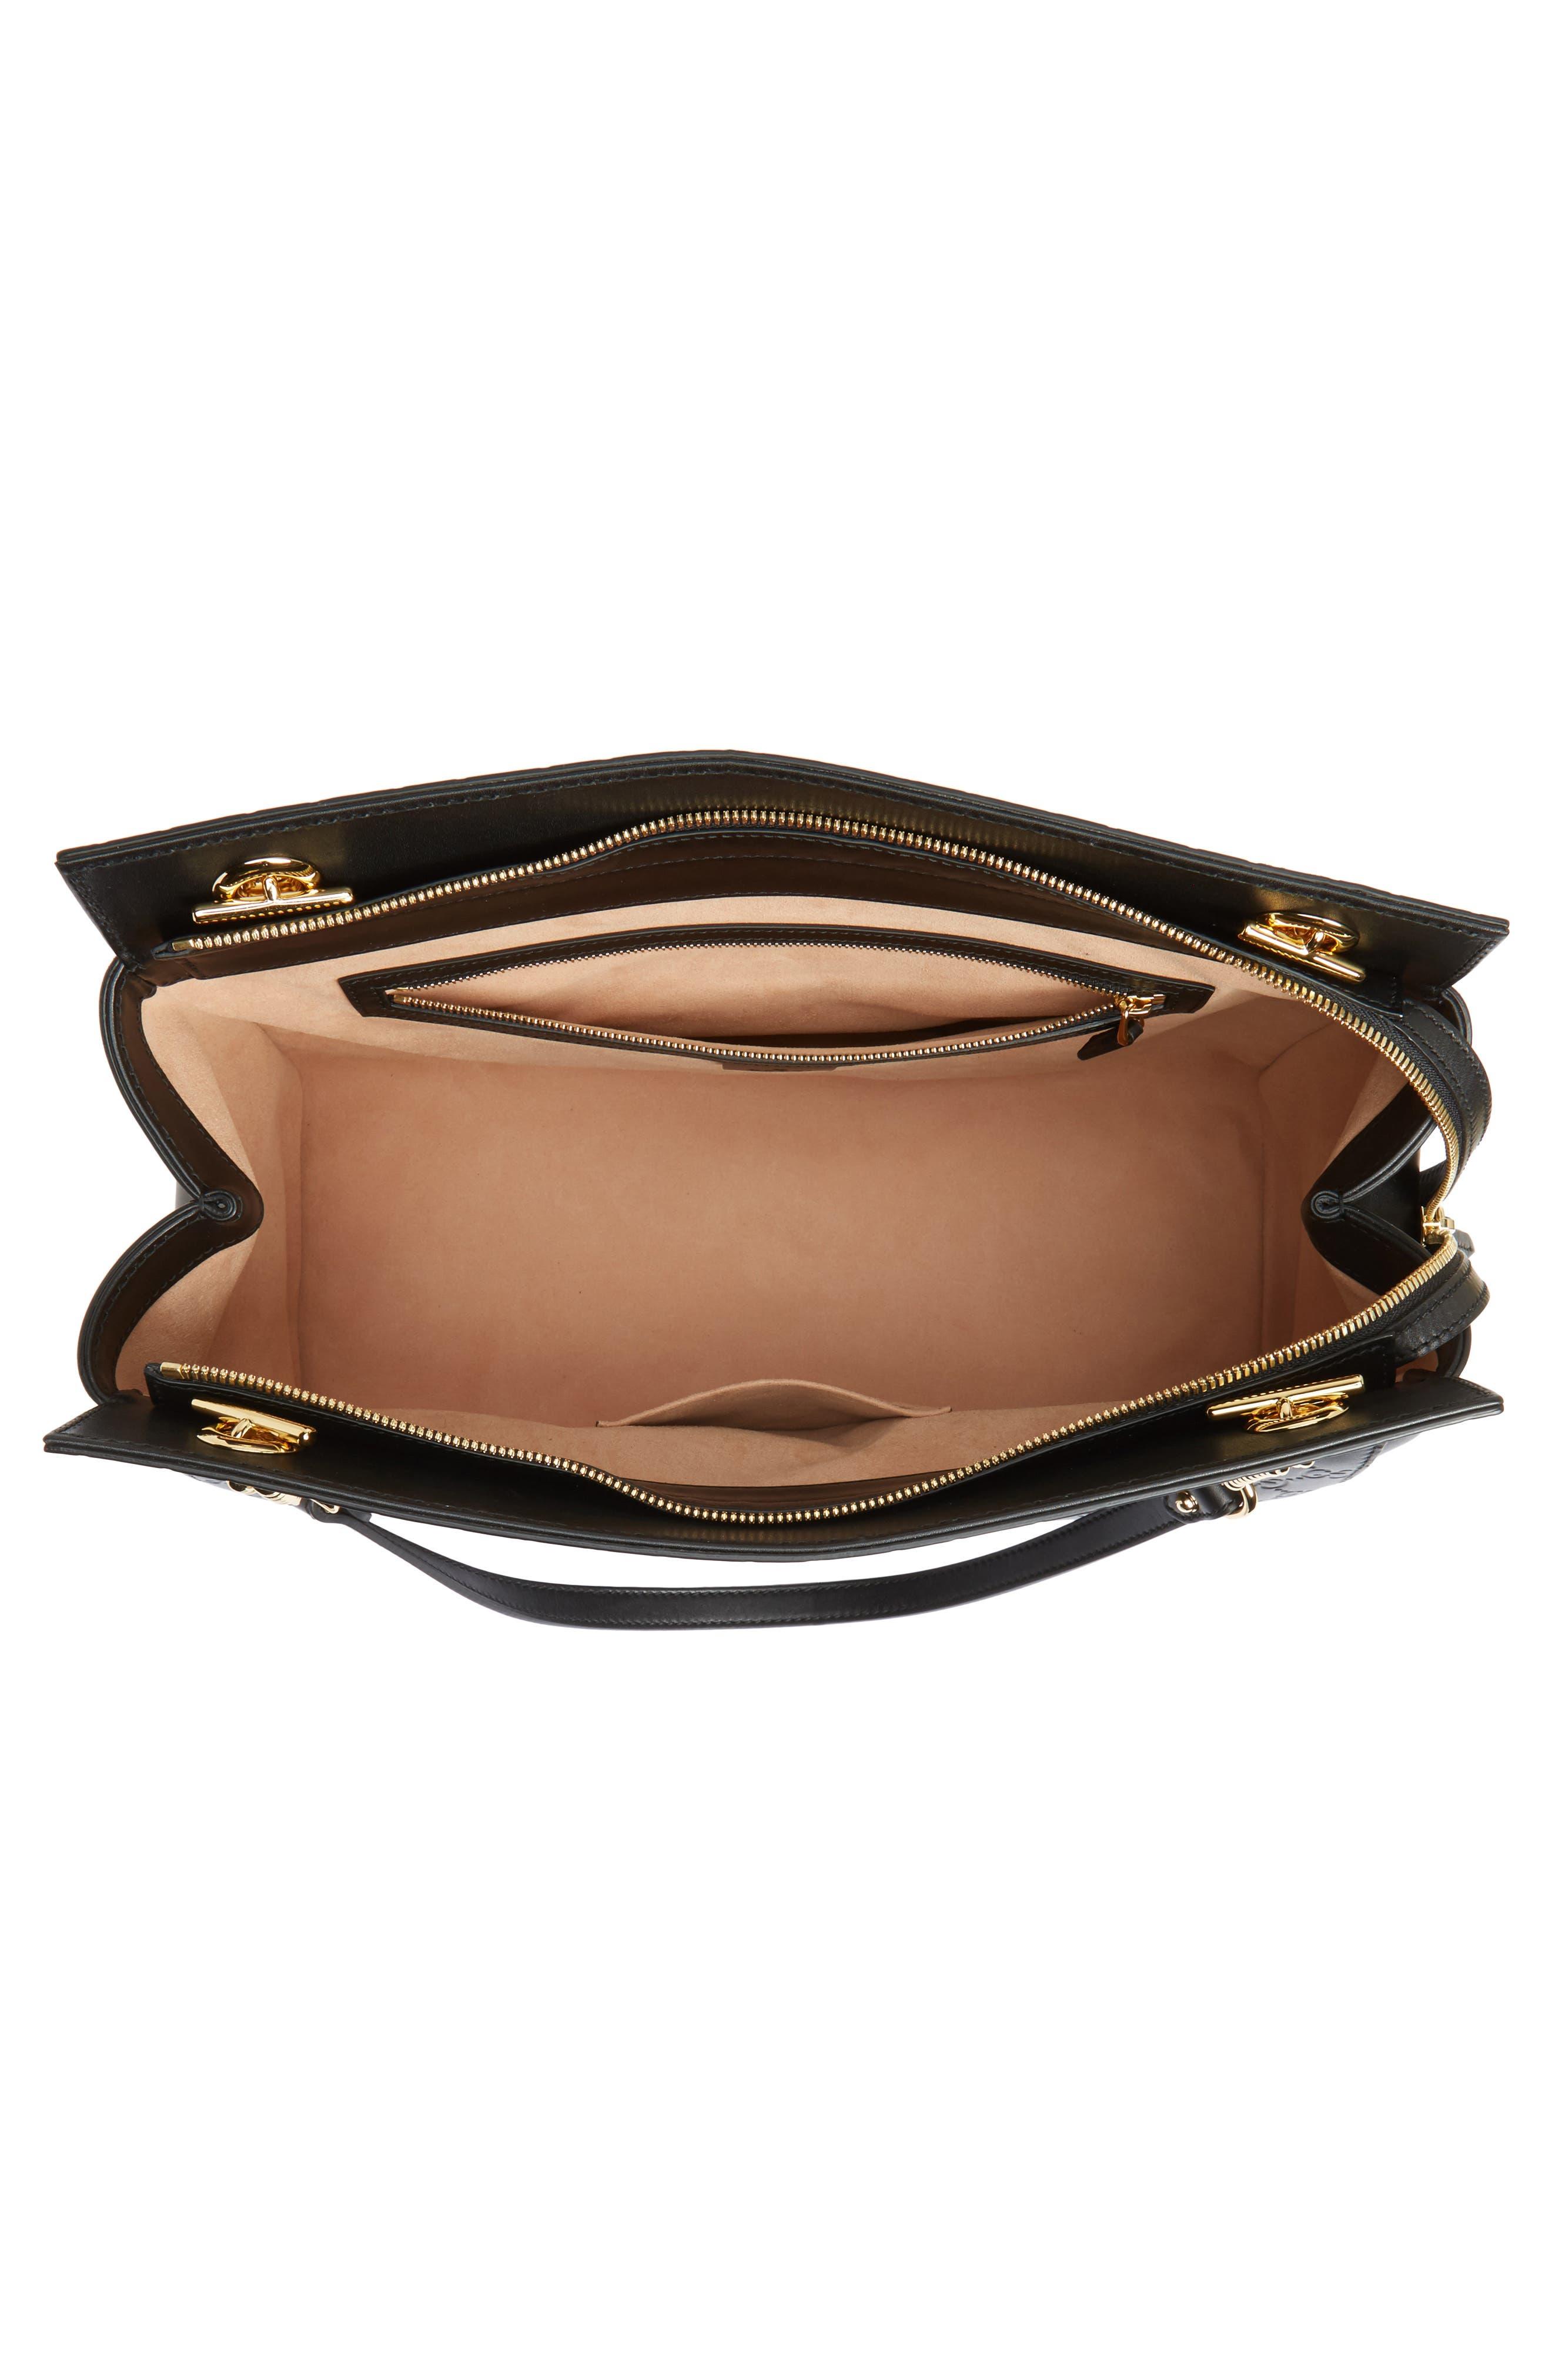 Large Signature Leather Shoulder Bag,                             Alternate thumbnail 4, color,                             001